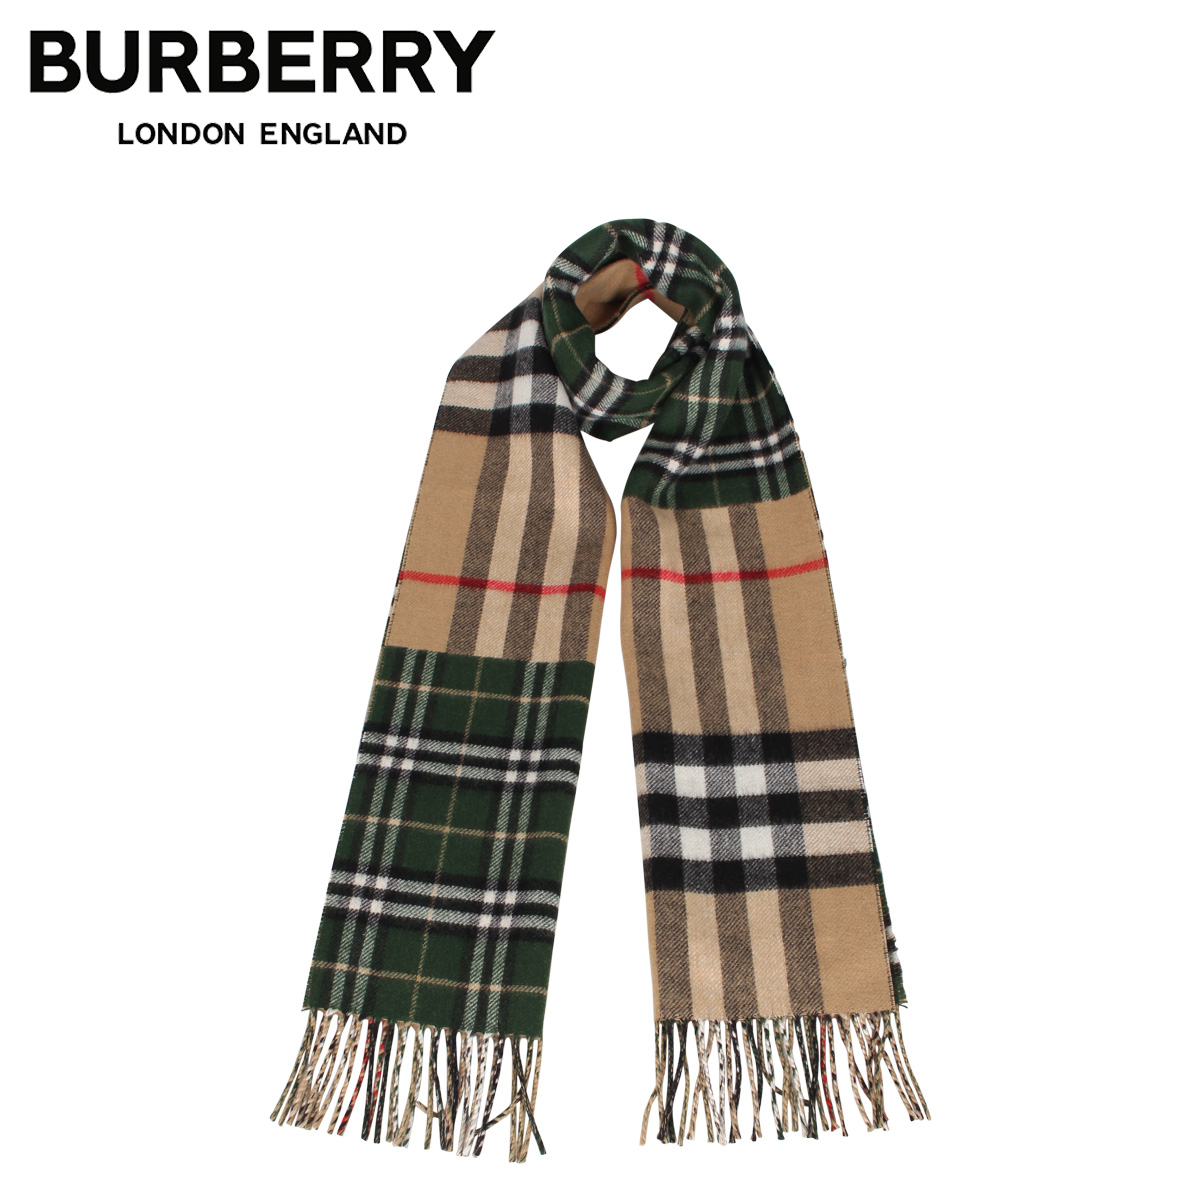 BURBERRY バーバリー マフラー スカーフ メンズ レディース チェック カシミア MUFFLER グリーン 8022477